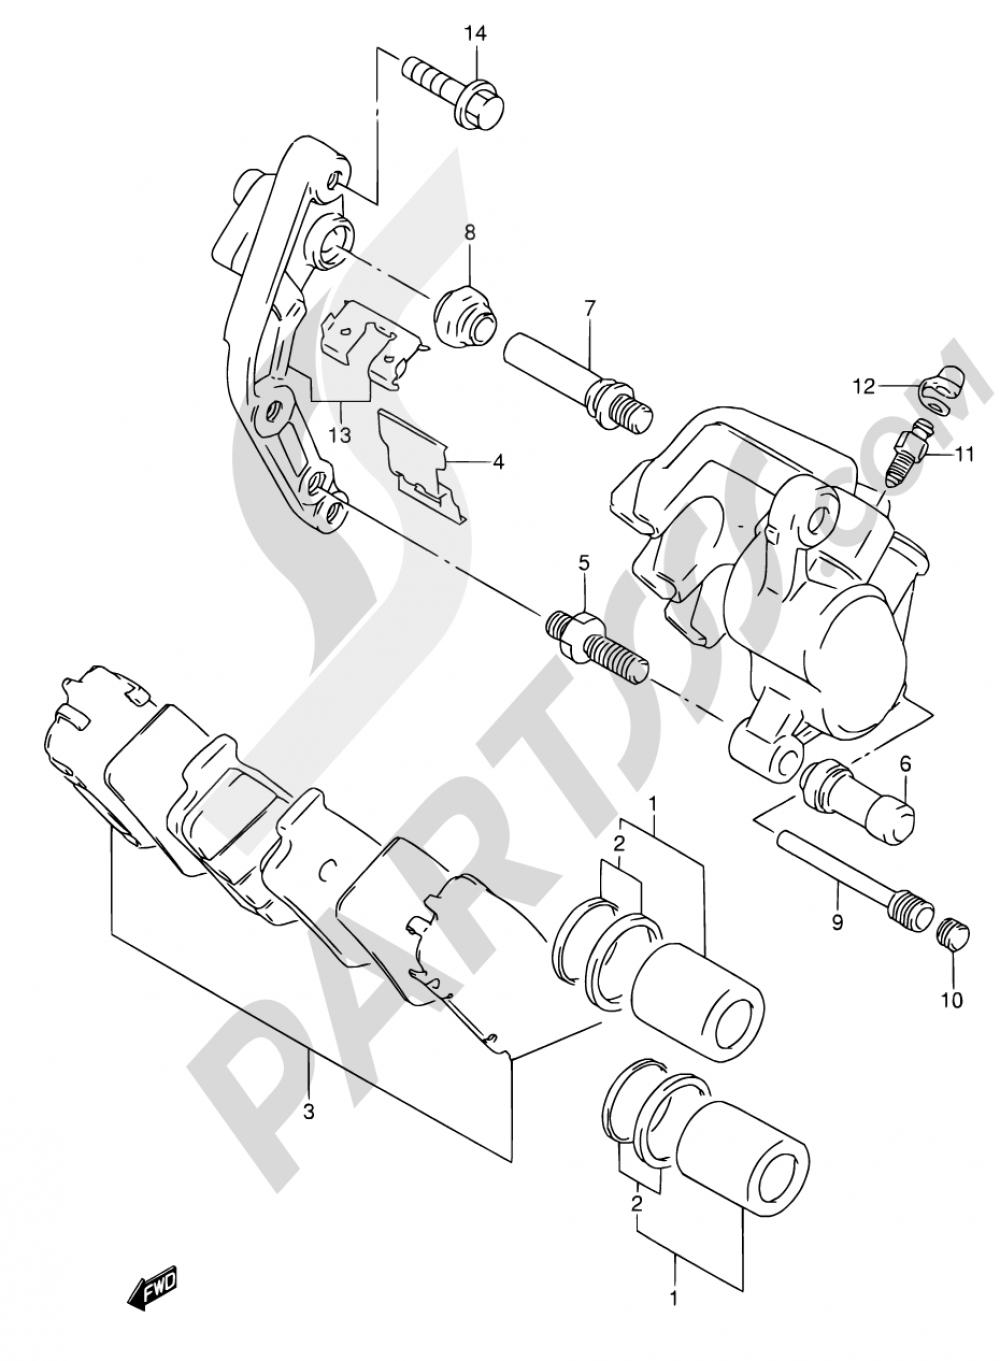 54 - FRONT CALIPERS Suzuki RF600R 1995